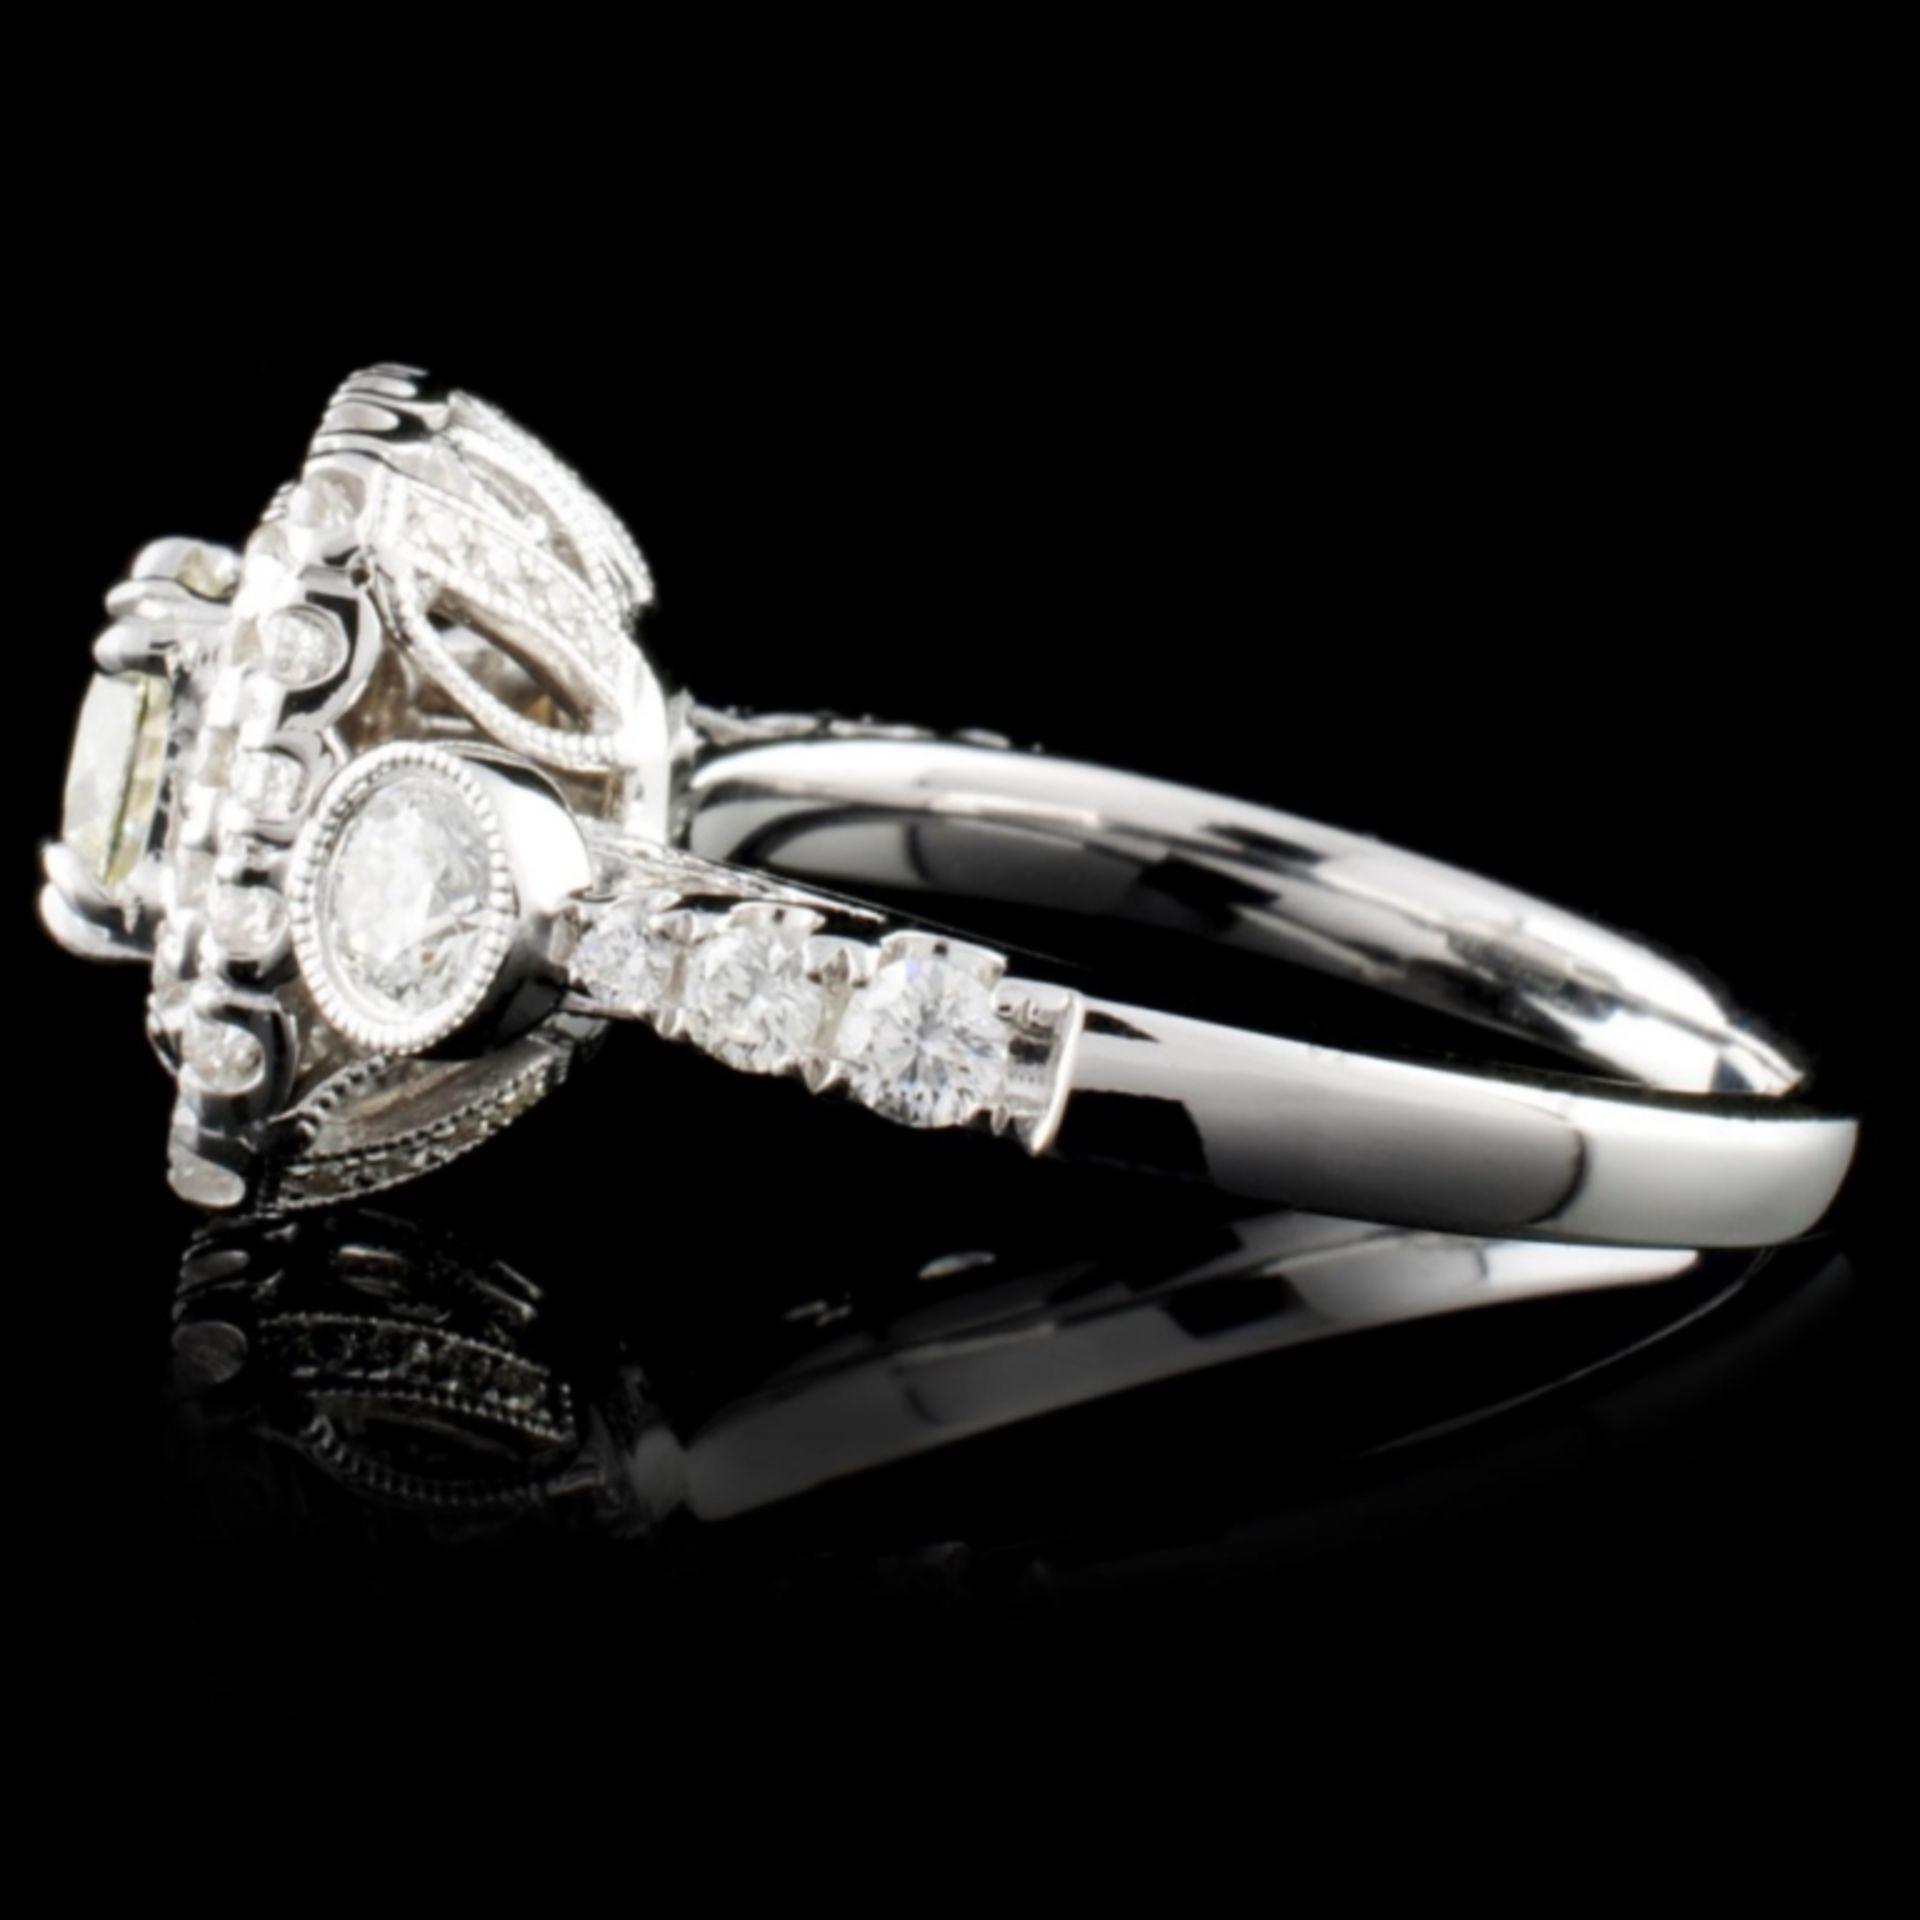 18K White Gold 1.60ctw Diamond Ring - Image 3 of 4